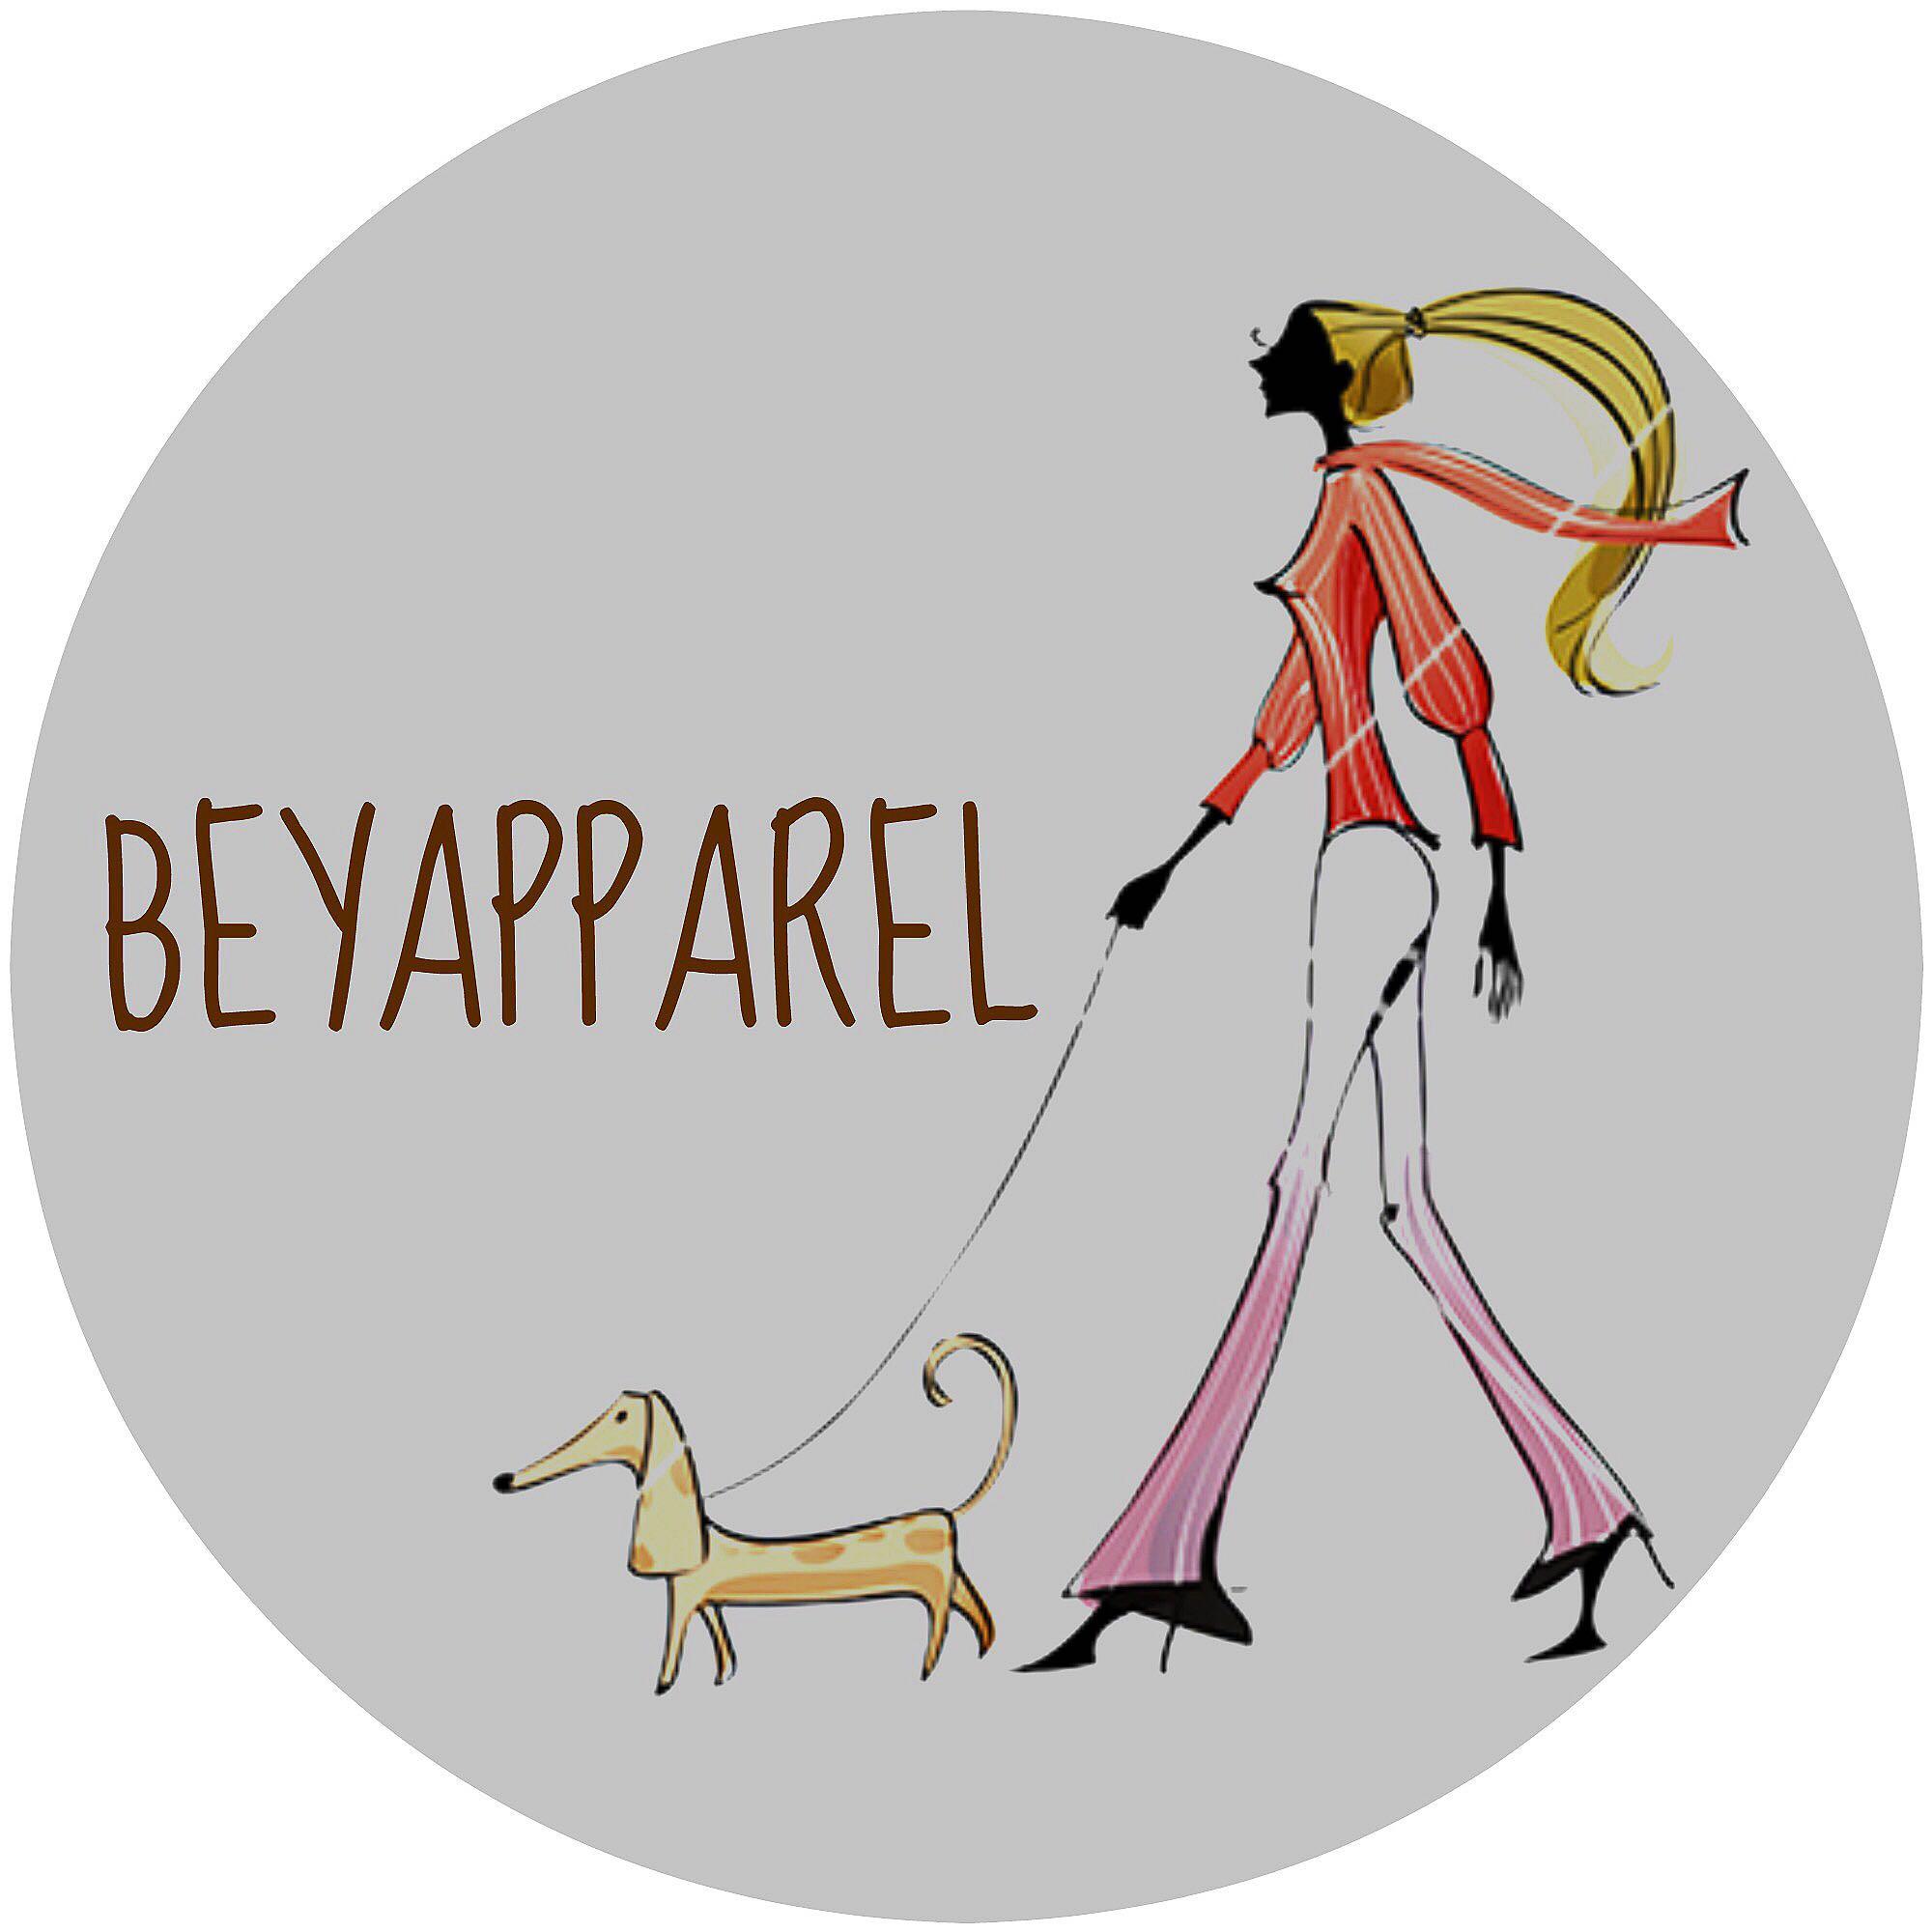 beyapparel